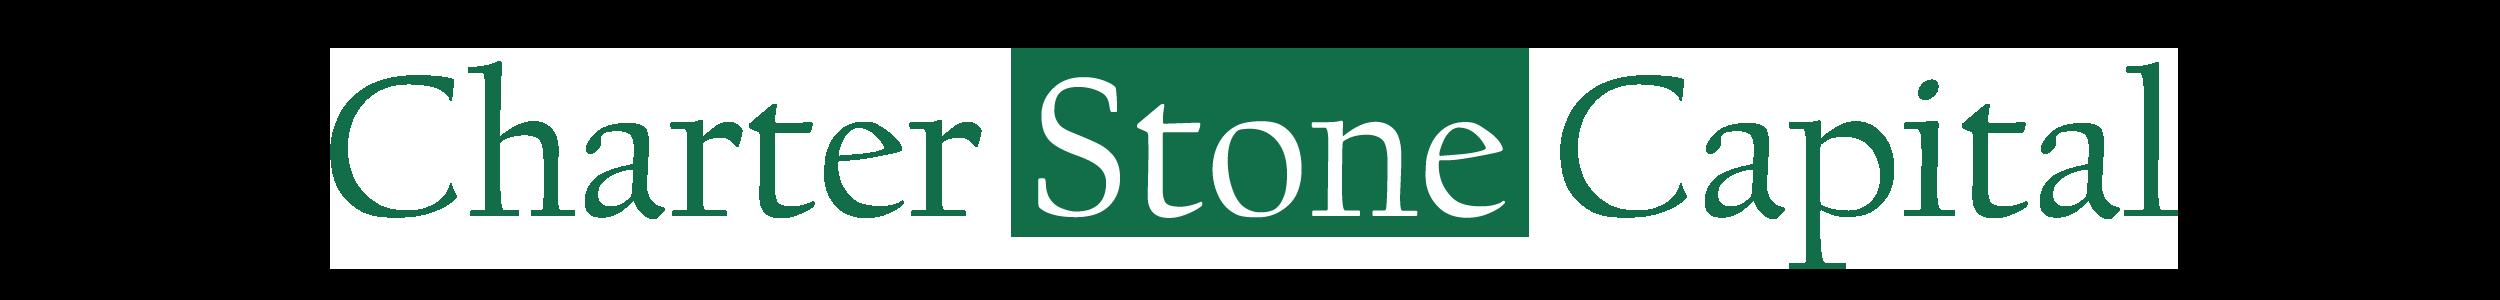 Charter Stone Capital